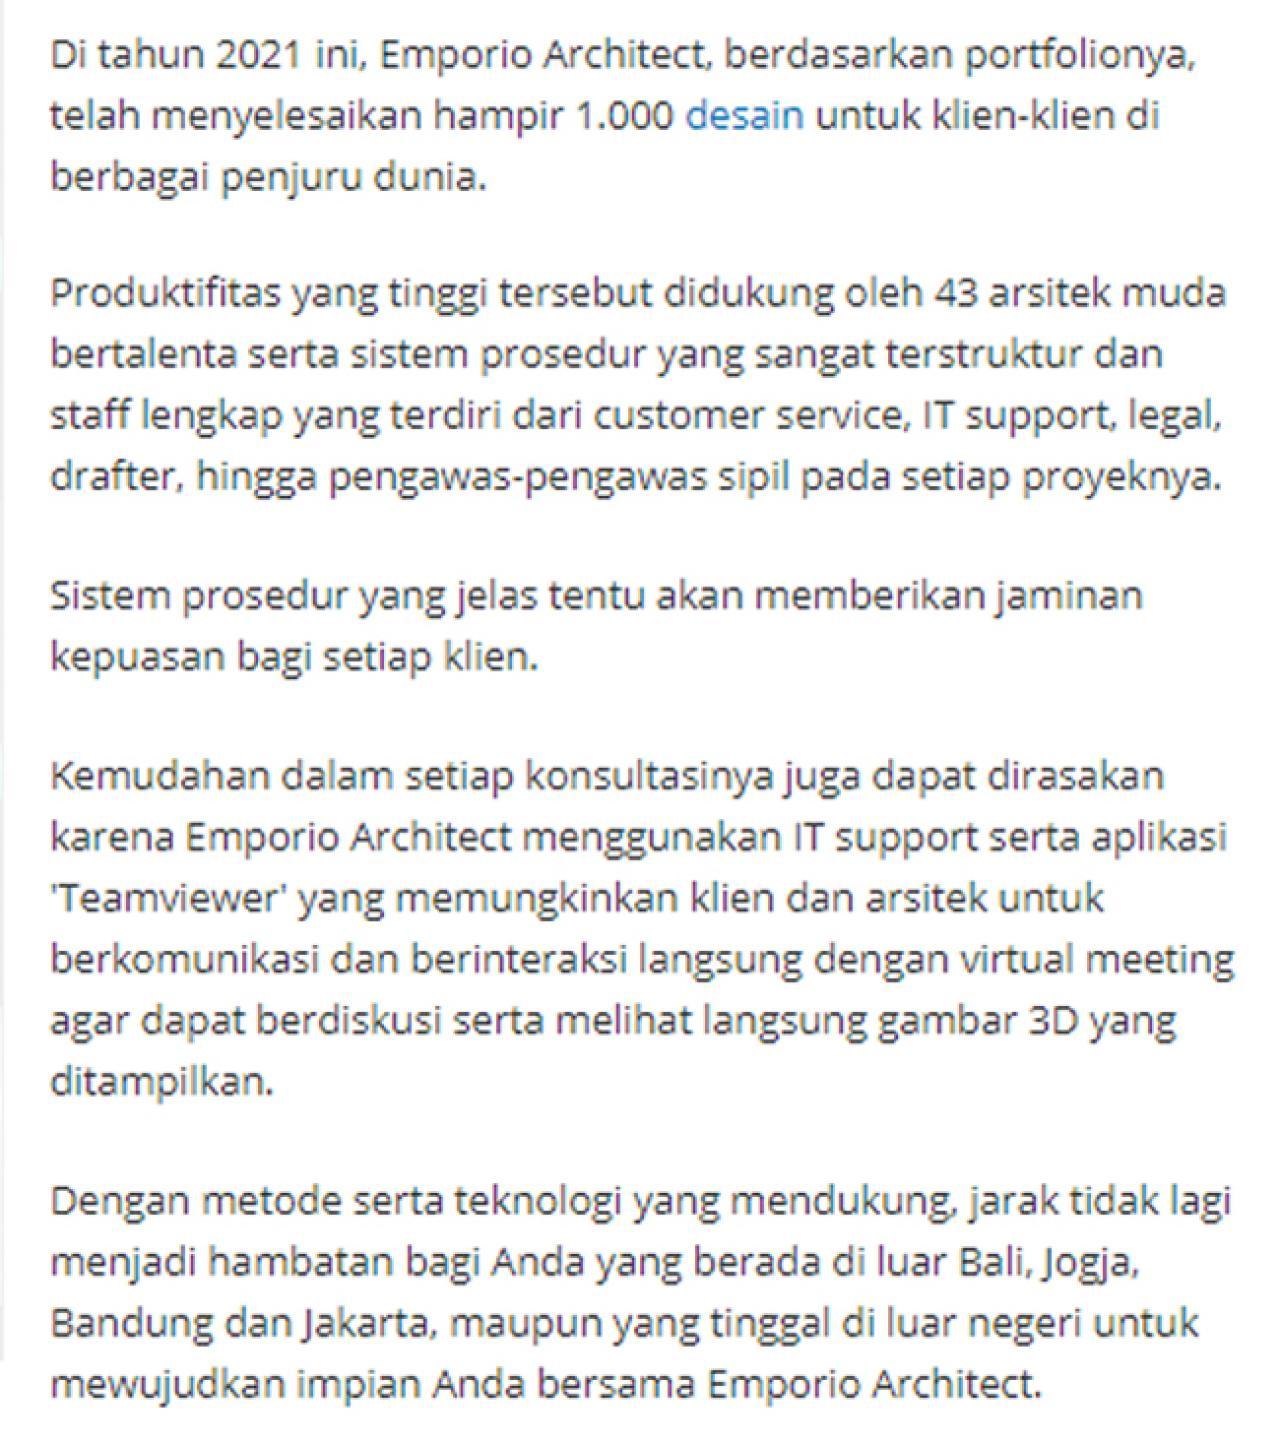 Ulasan Media TribunJakarta.com - Wujudkan Hunian Impian Bersama Emporio Architect, Karya Anak Bangsa yang Sukses Tembus Internasional 5 5